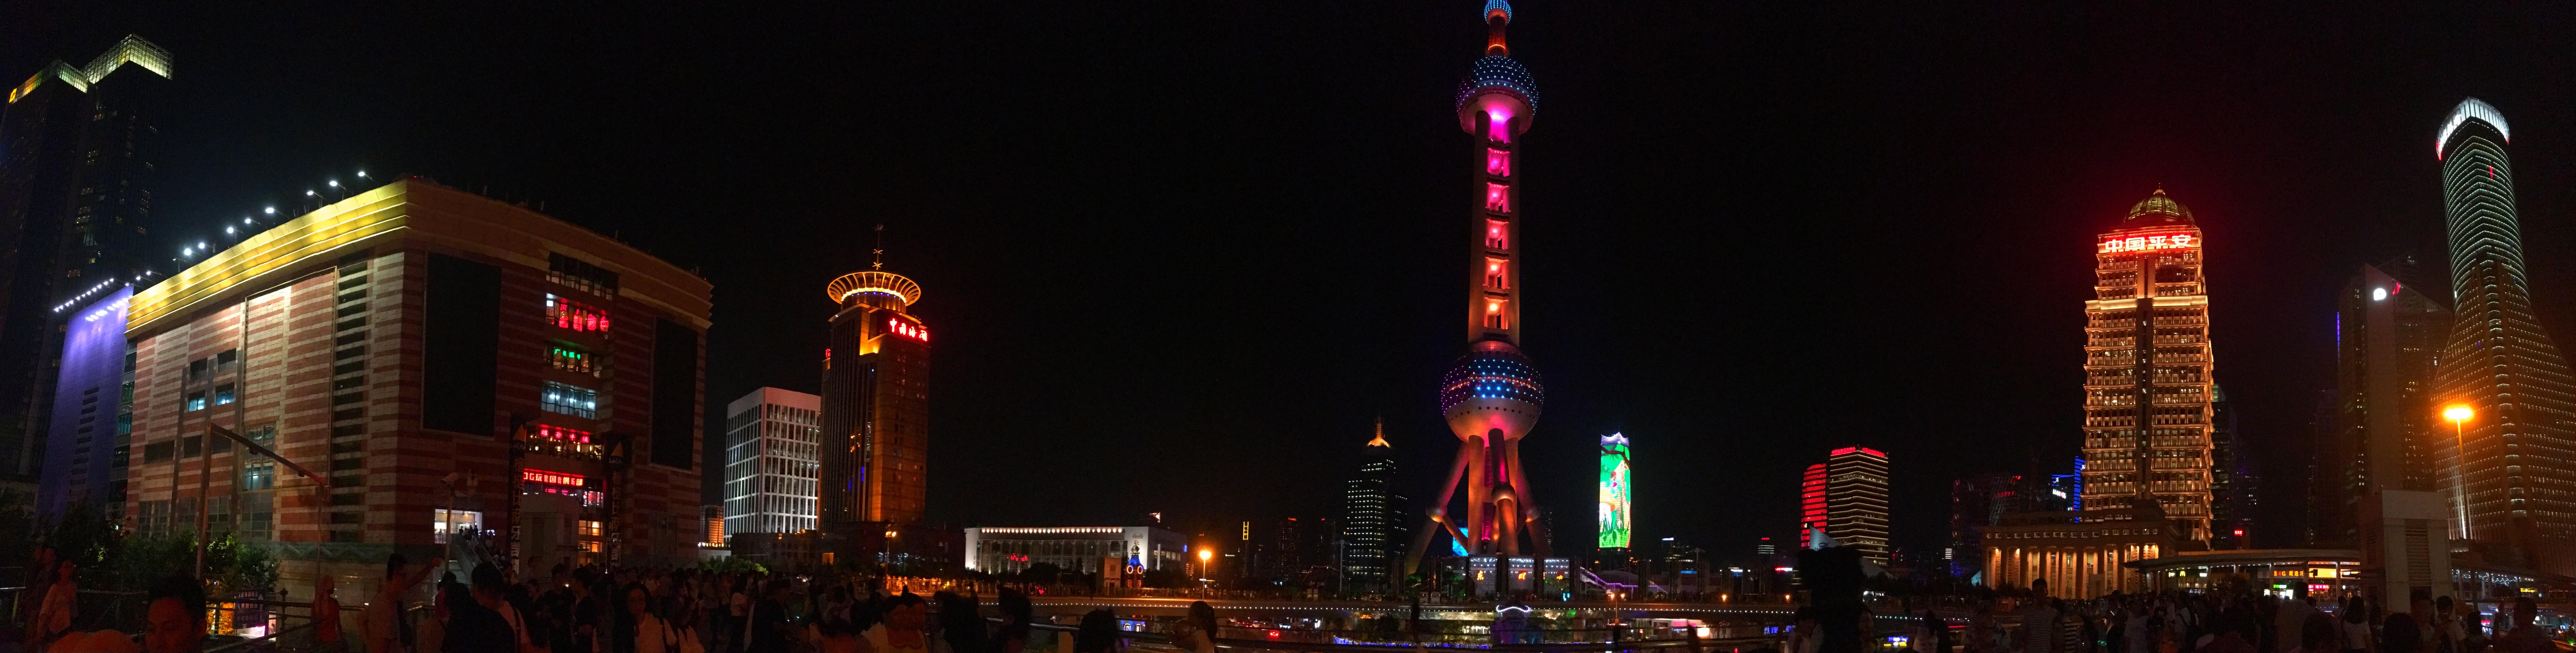 Torre de la Perla Shanghai